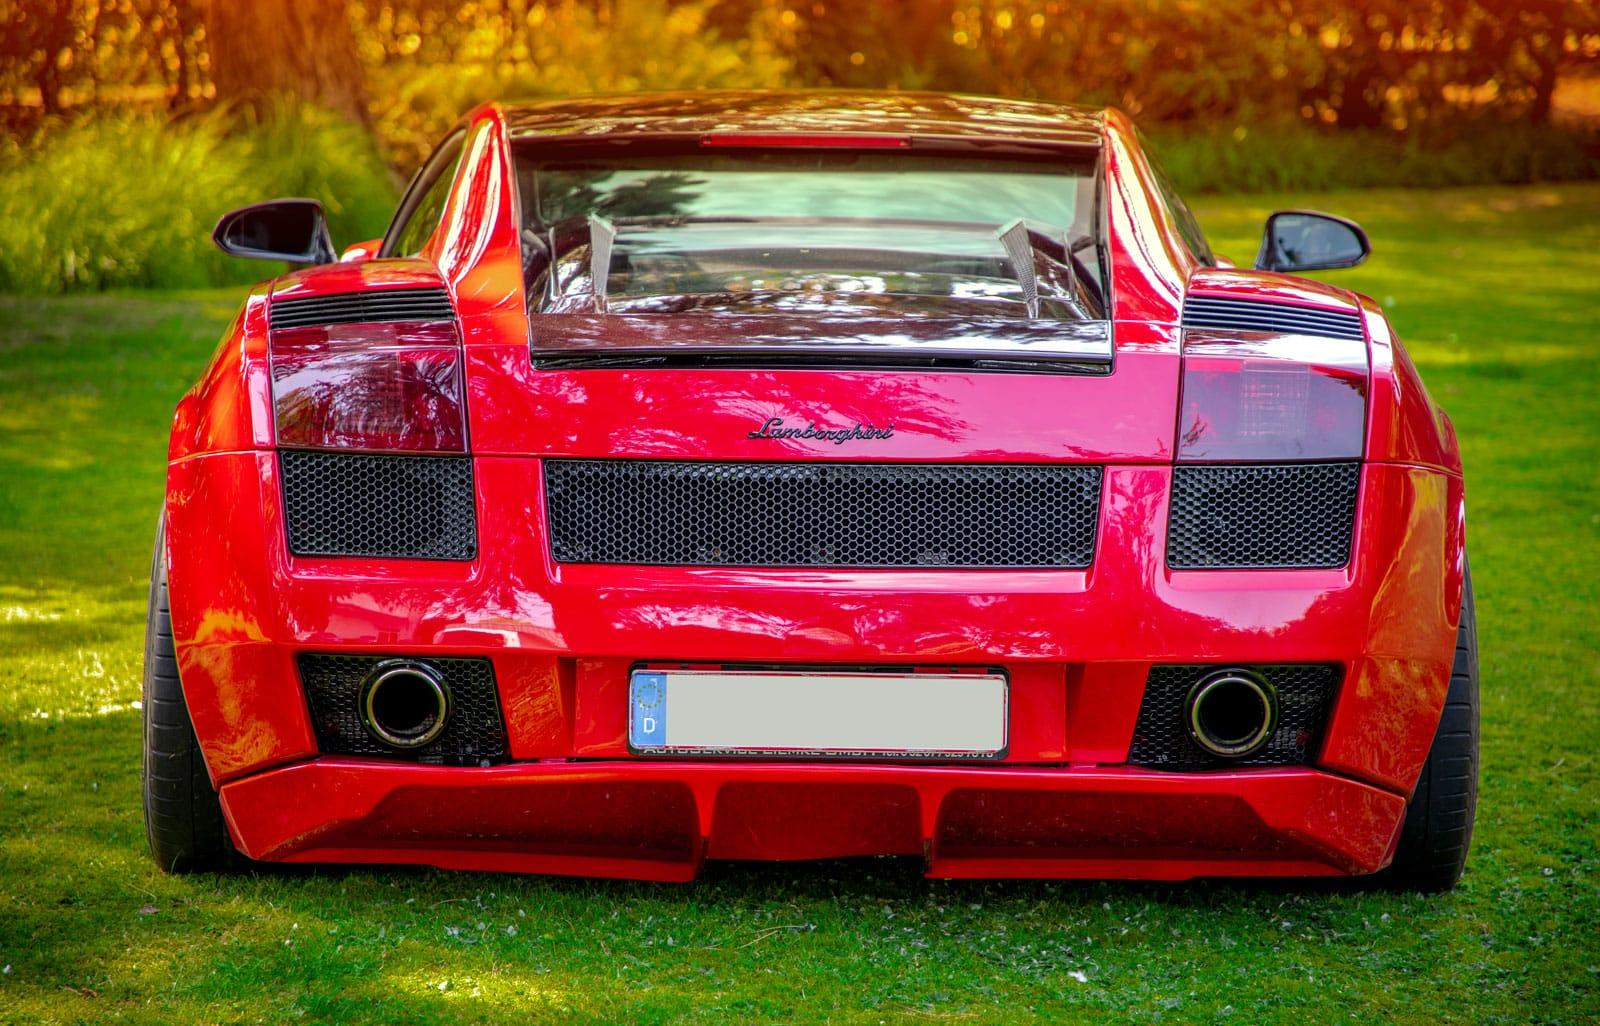 Fotografie Paderborn • DESIGN 7 • Outdoor • Lamborghini Gallardo rot hinten • Werbeagentur Paderborn